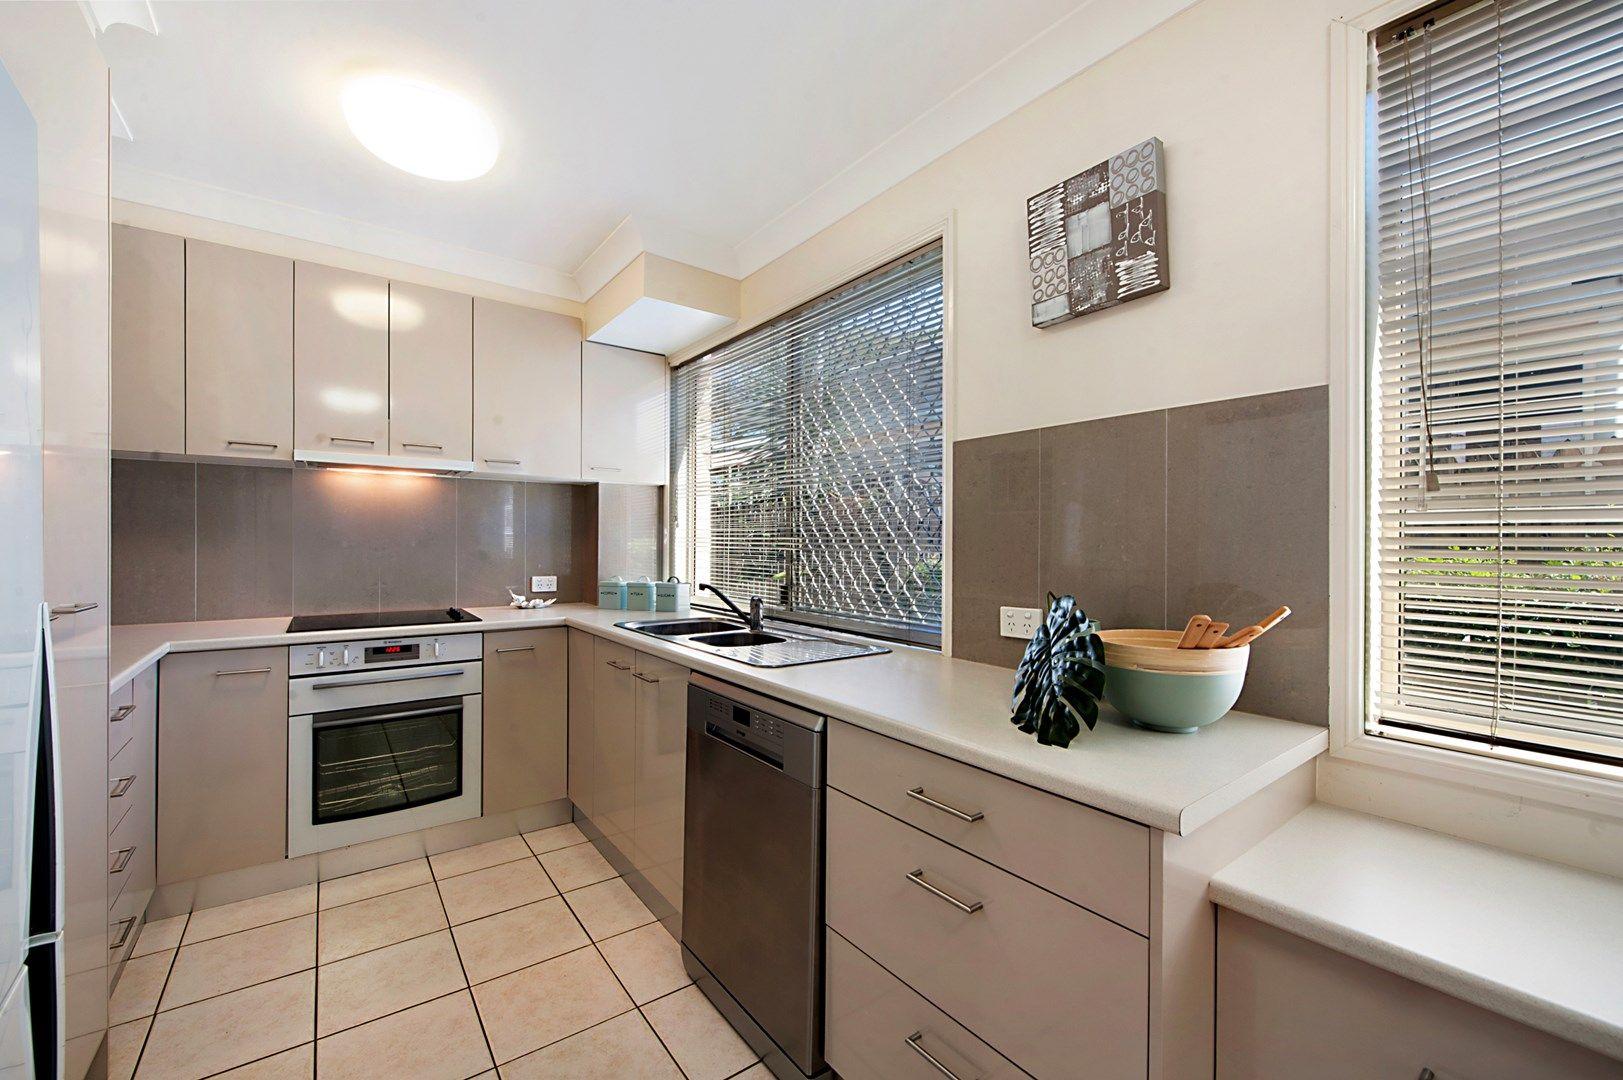 1/39 Toolona Street, Tugun QLD 4224, Image 0